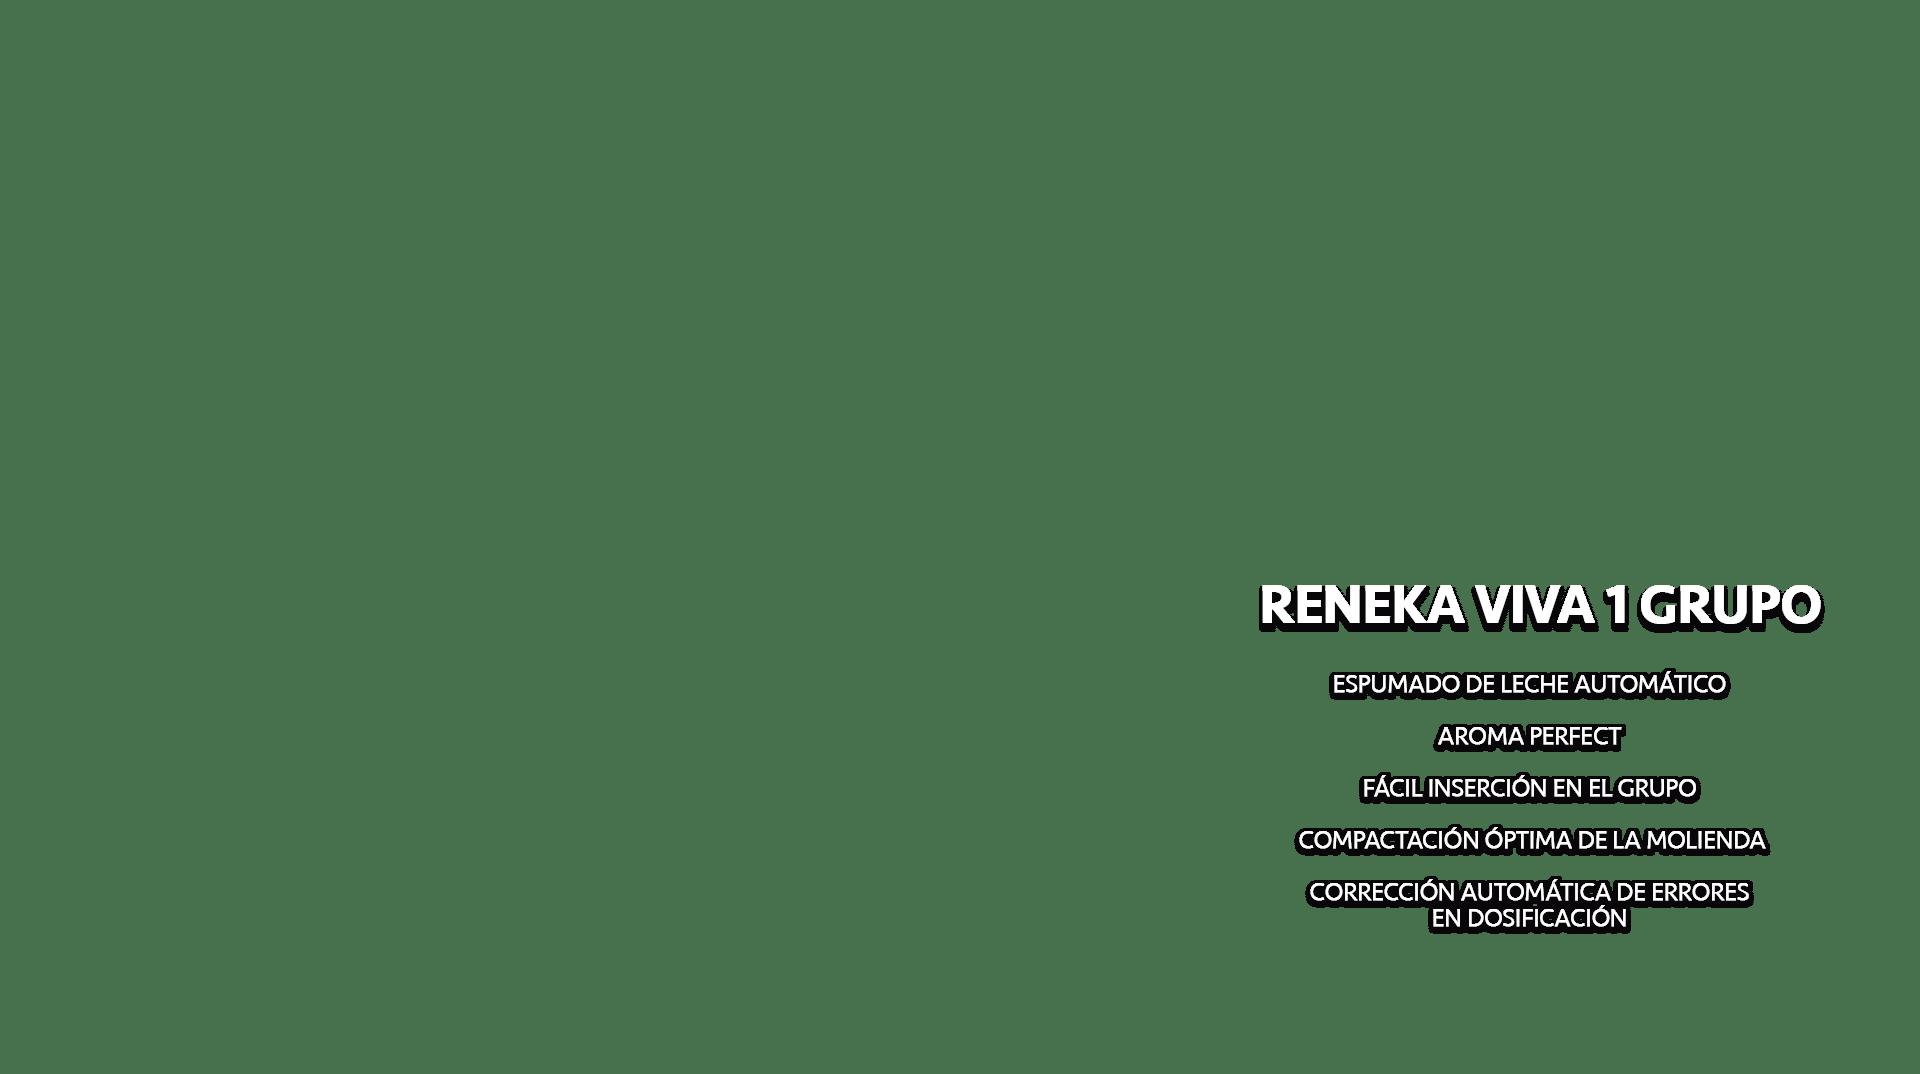 Maquina de espresso Reneka Viva 1 Grupo Texto